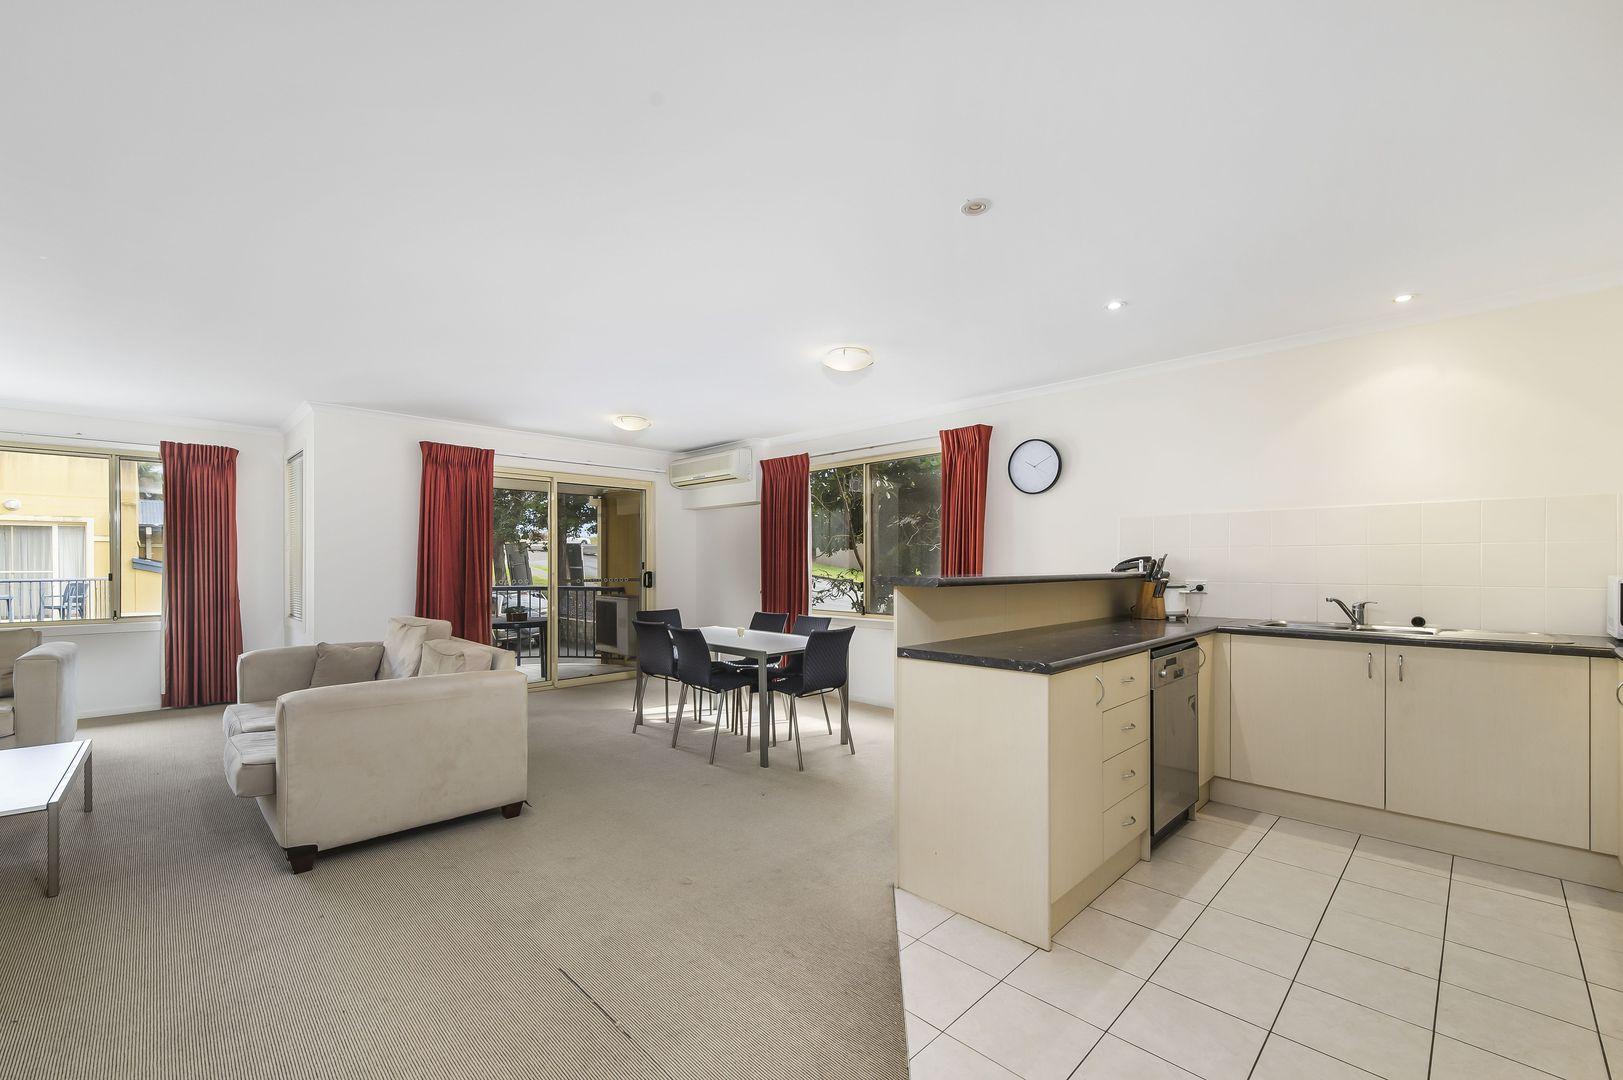 13/216 Matthew Flinders  Drive, Port Macquarie NSW 2444, Image 1